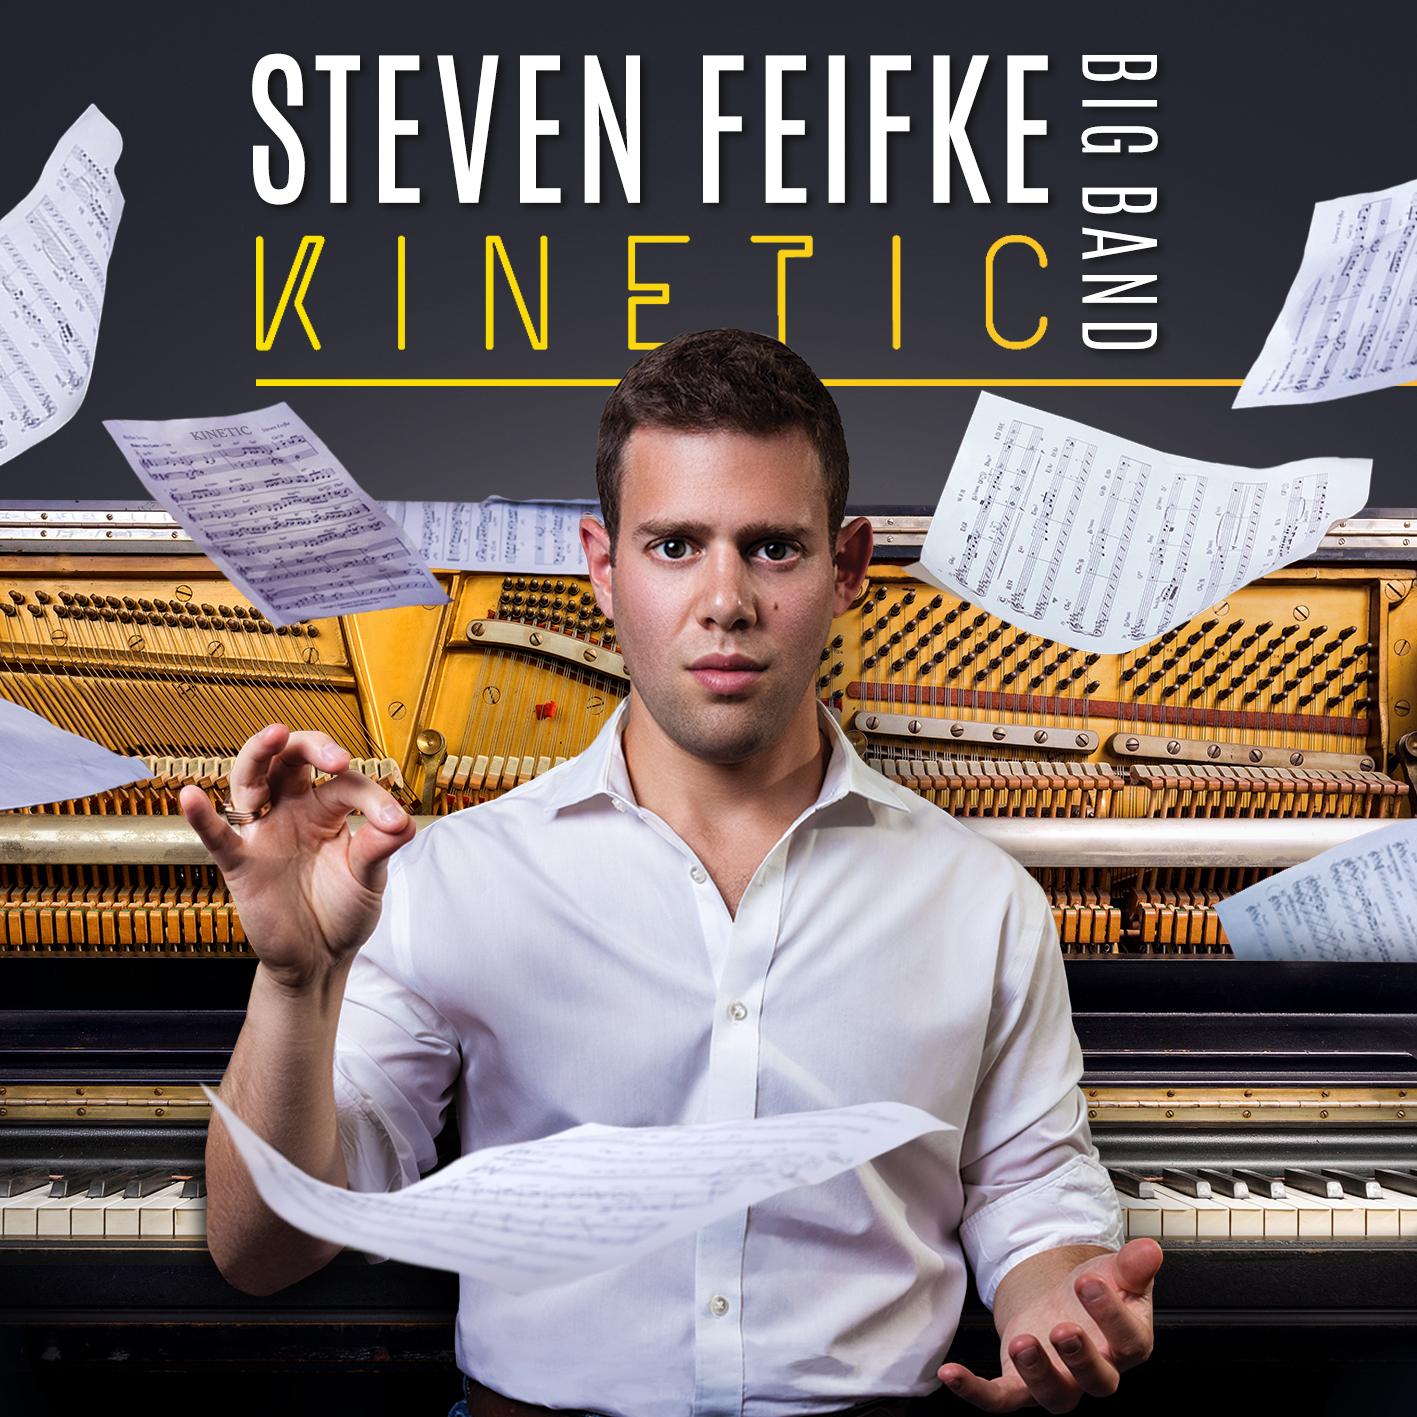 NEW RELEASE: Steven Feifke Big Band's KINETIC out April 9, 2021 via Outside in Music